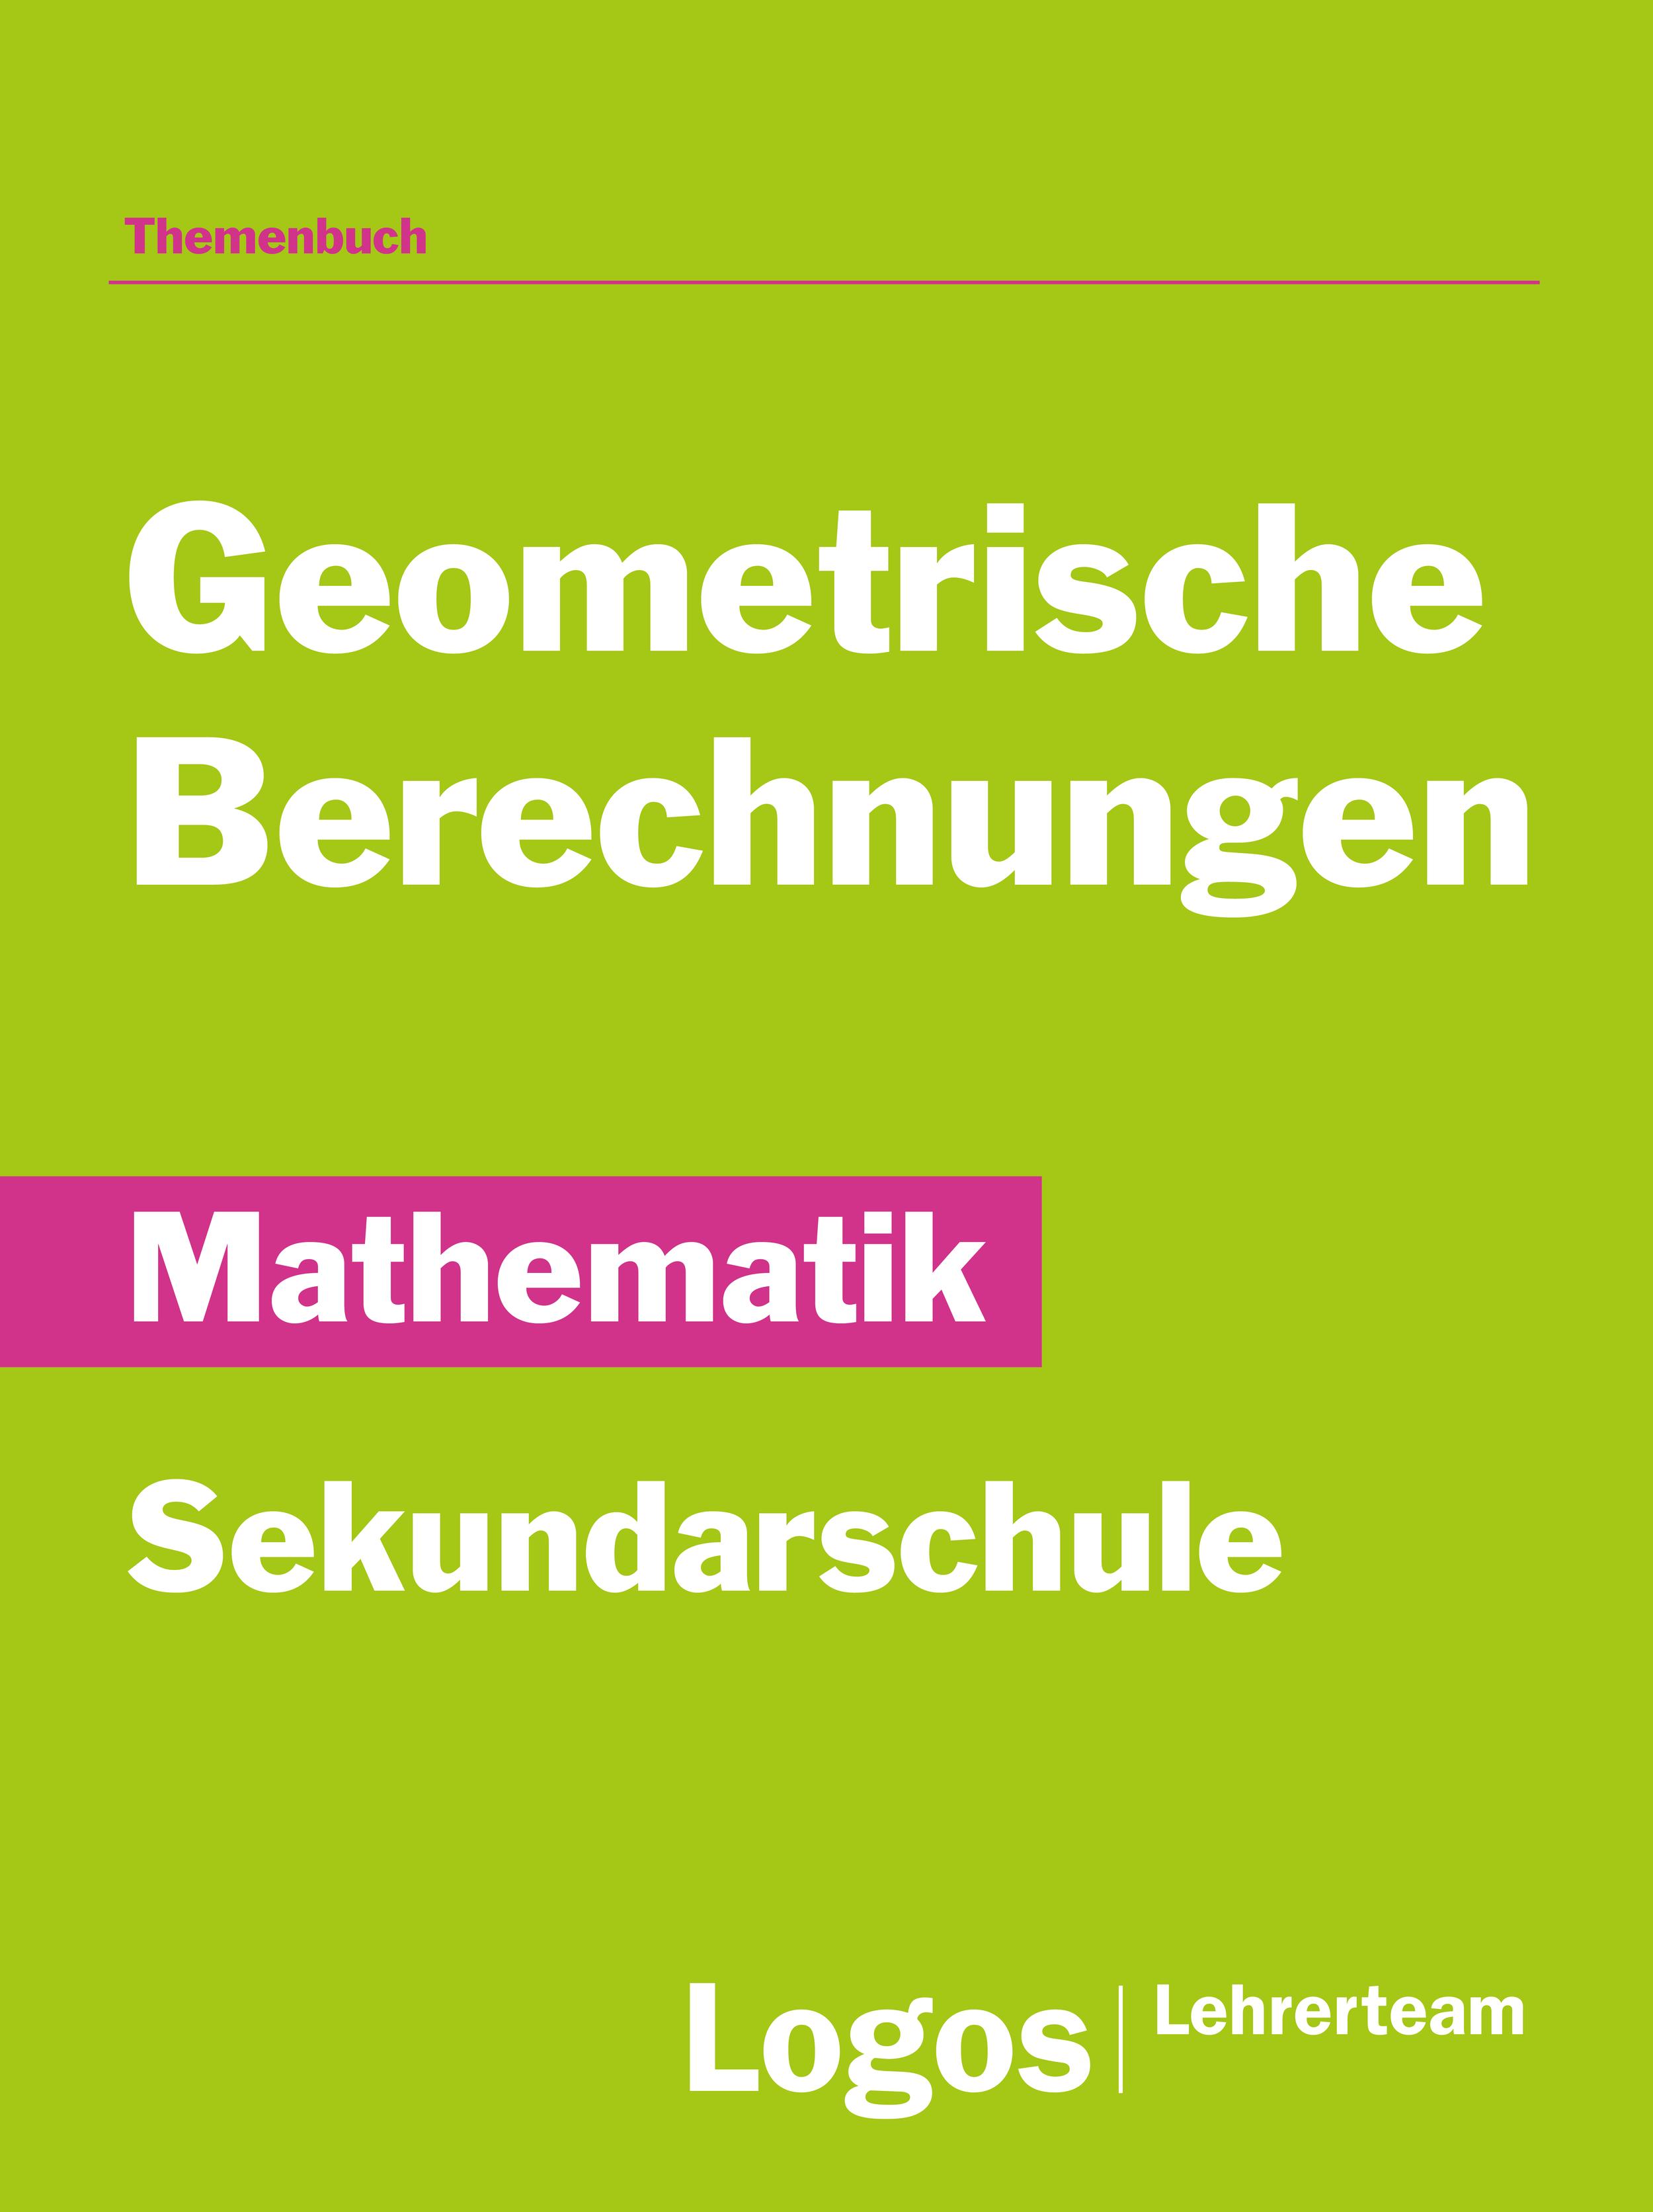 Mathematik Geometrische Berechnungen - Sekundarschule